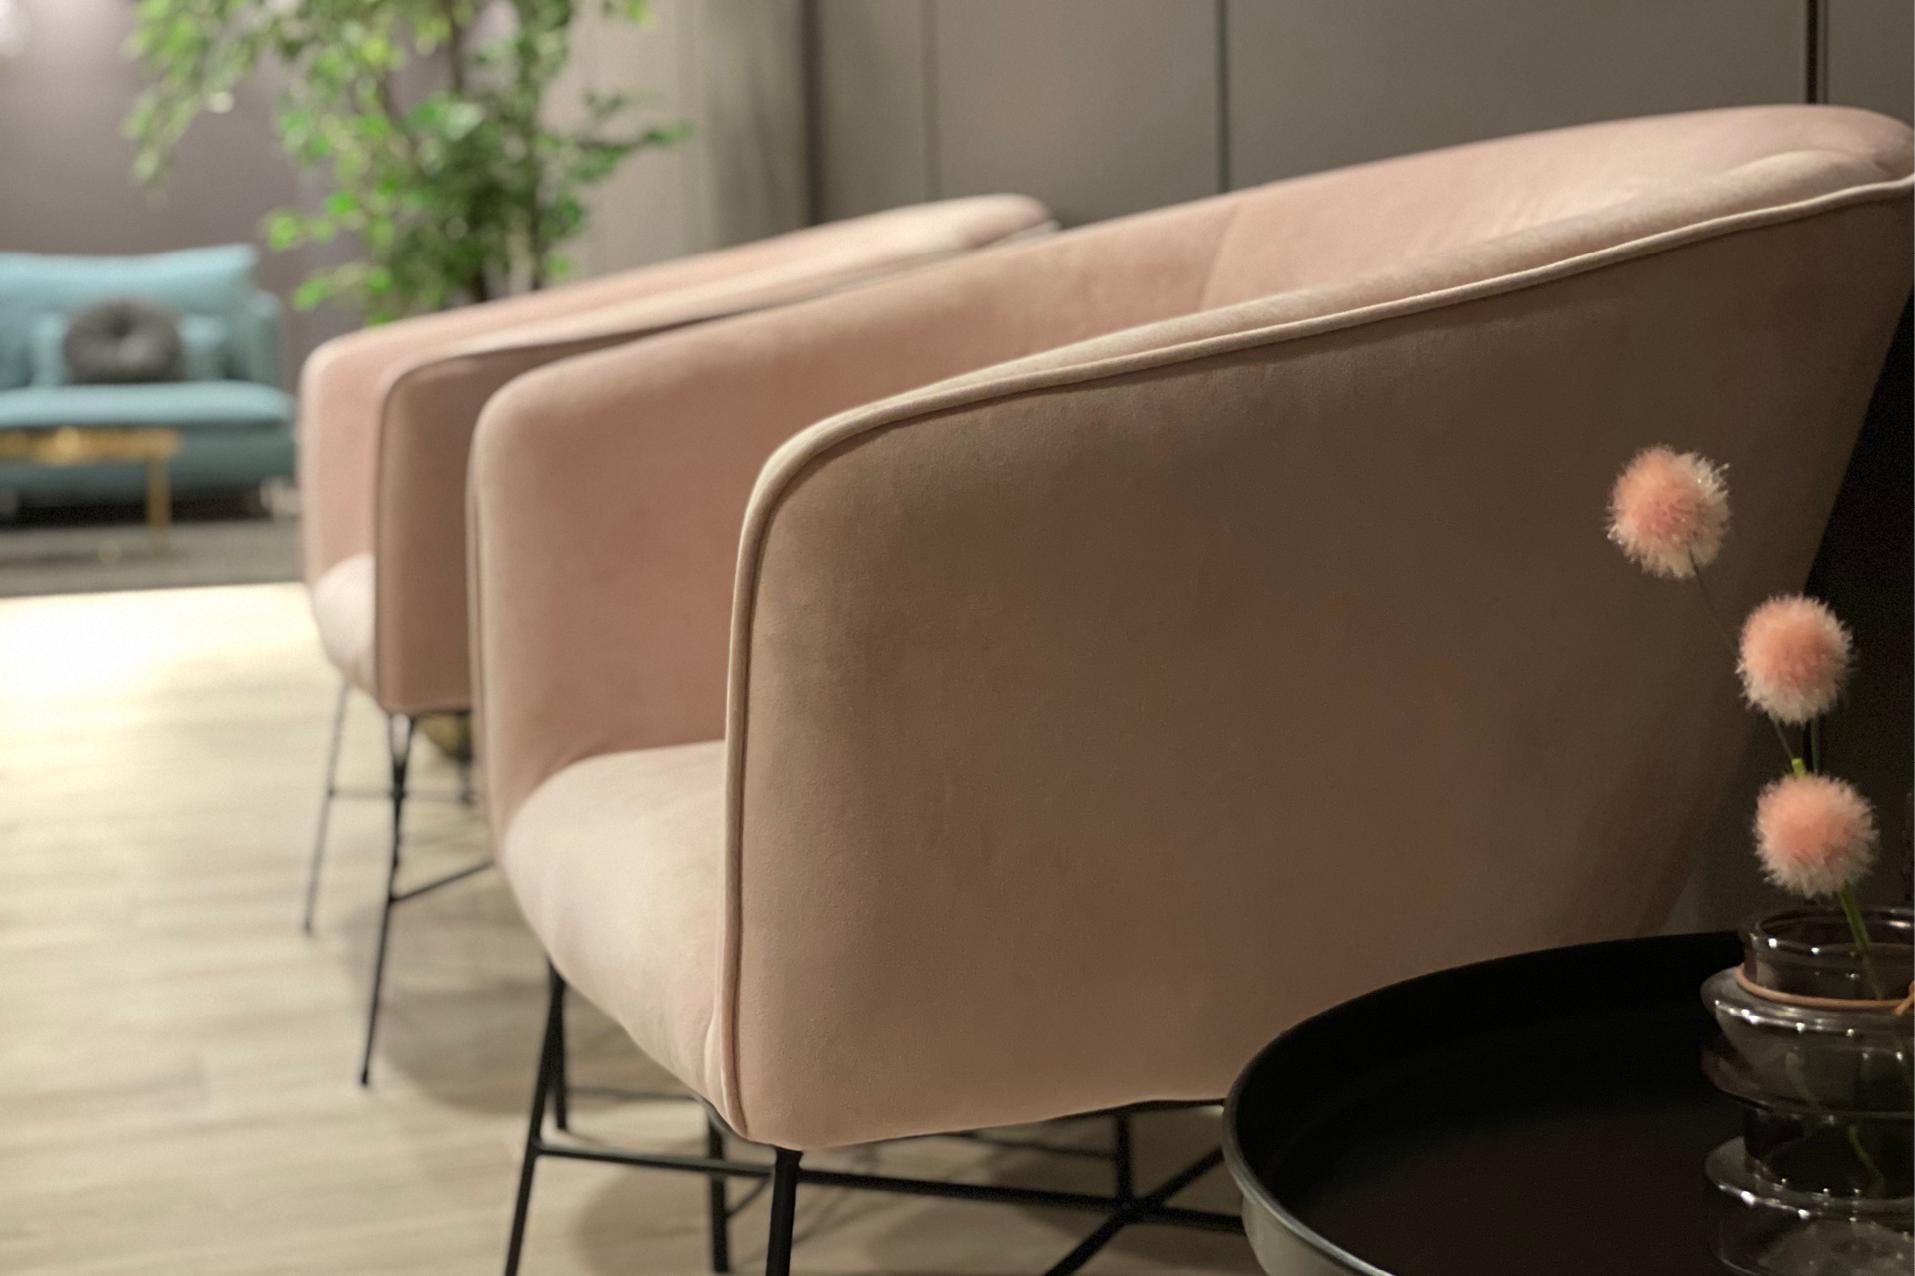 Sosial sone i kontorbygg med lyserosa lenestoler